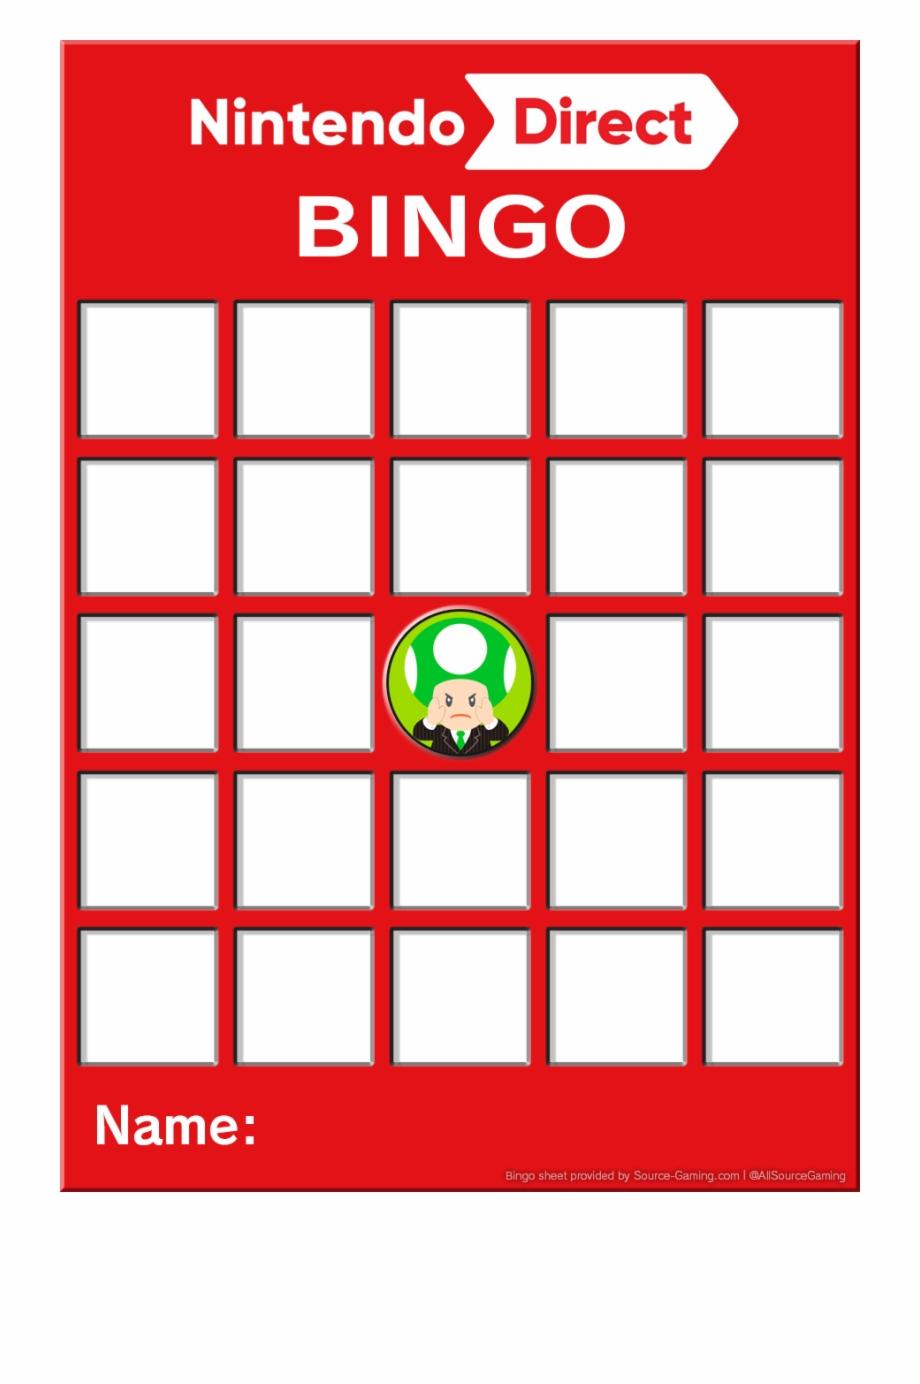 Bingo Card Png.